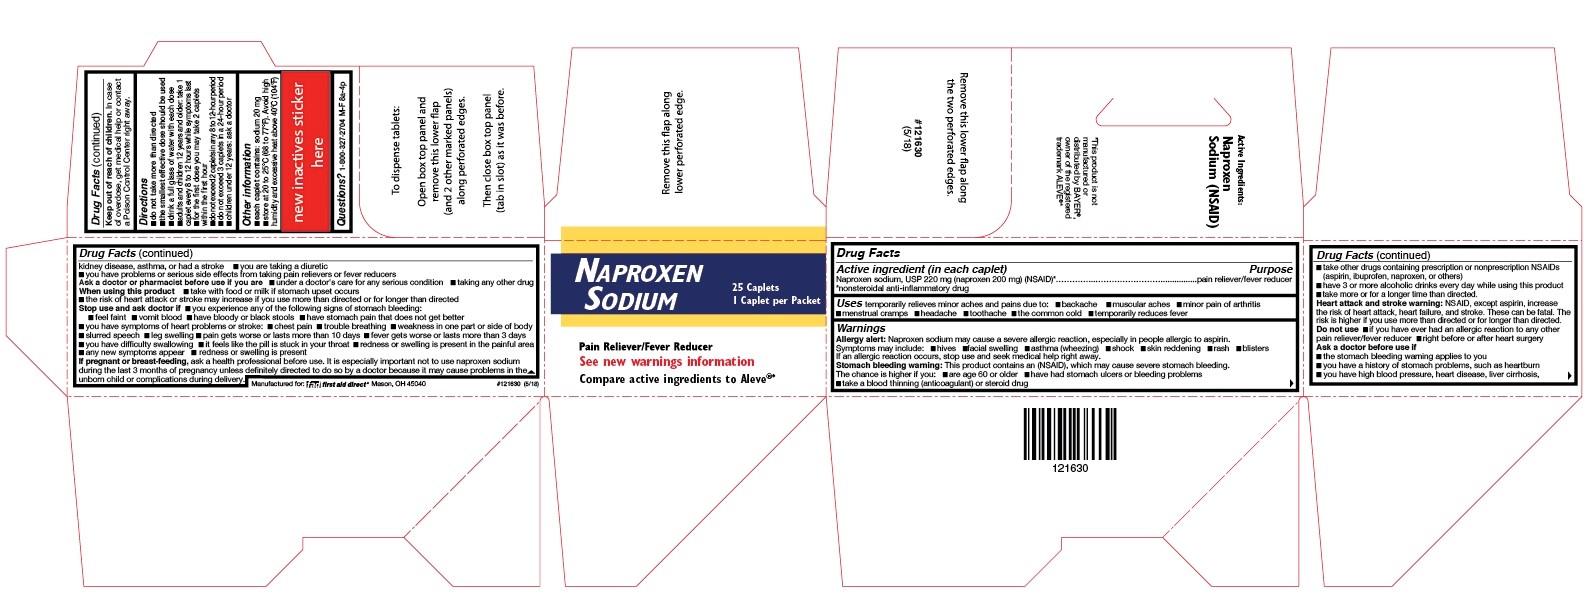 Naproxen Sodium Label